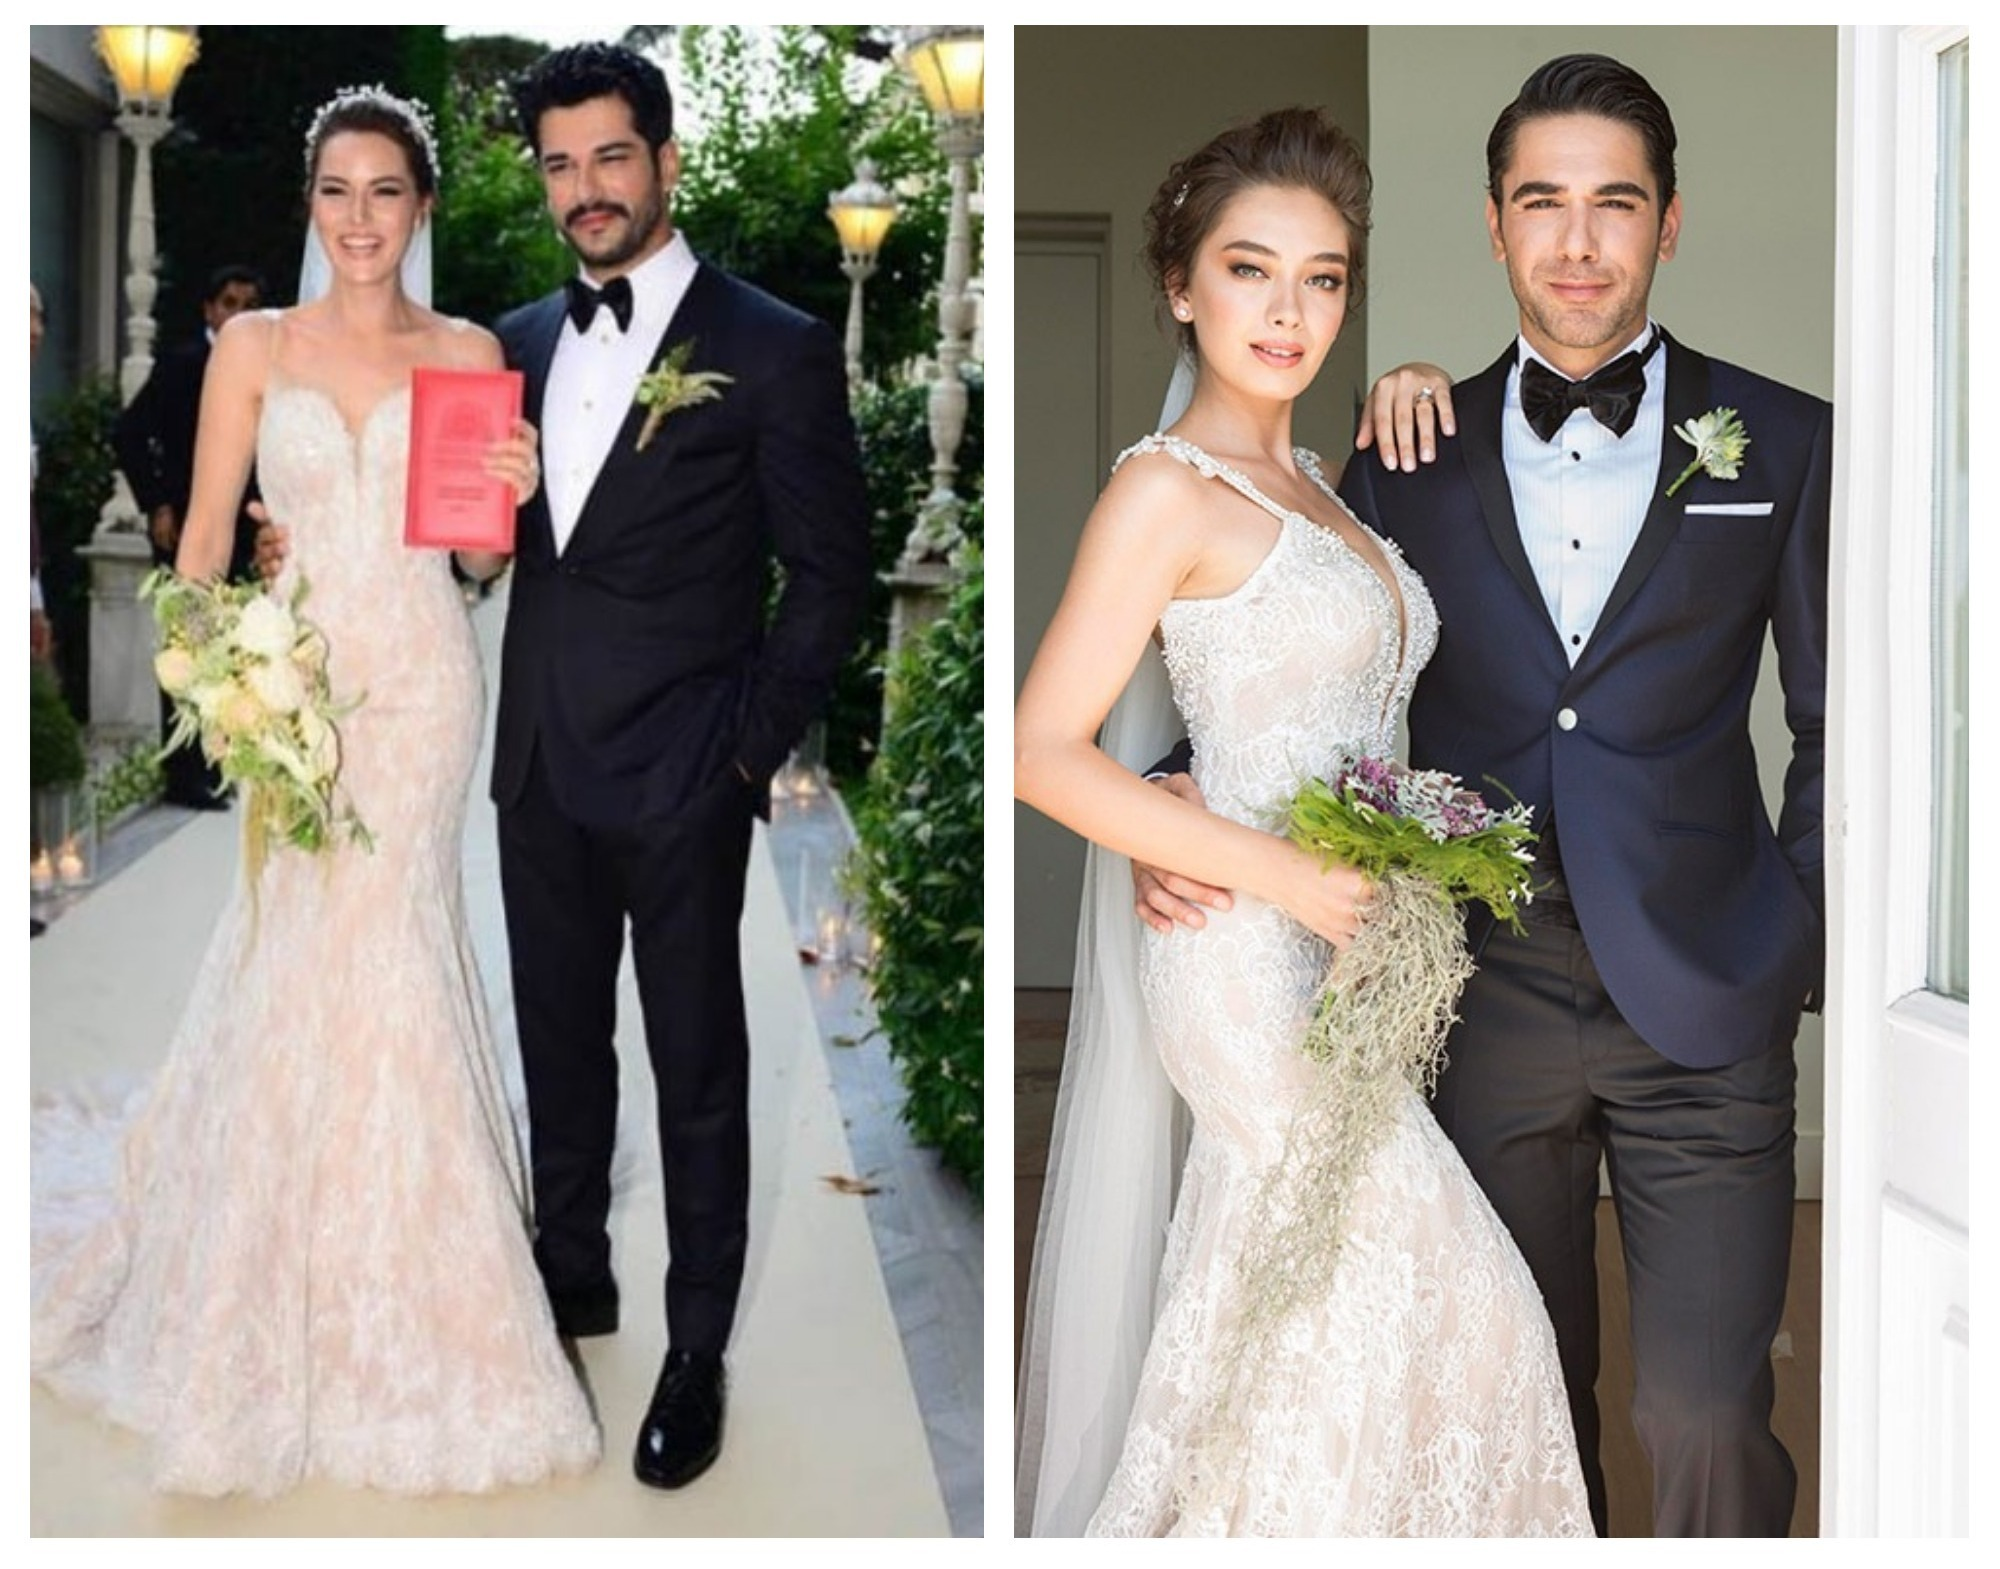 Бурак озчивит свадьба с фахрие эвджен фото